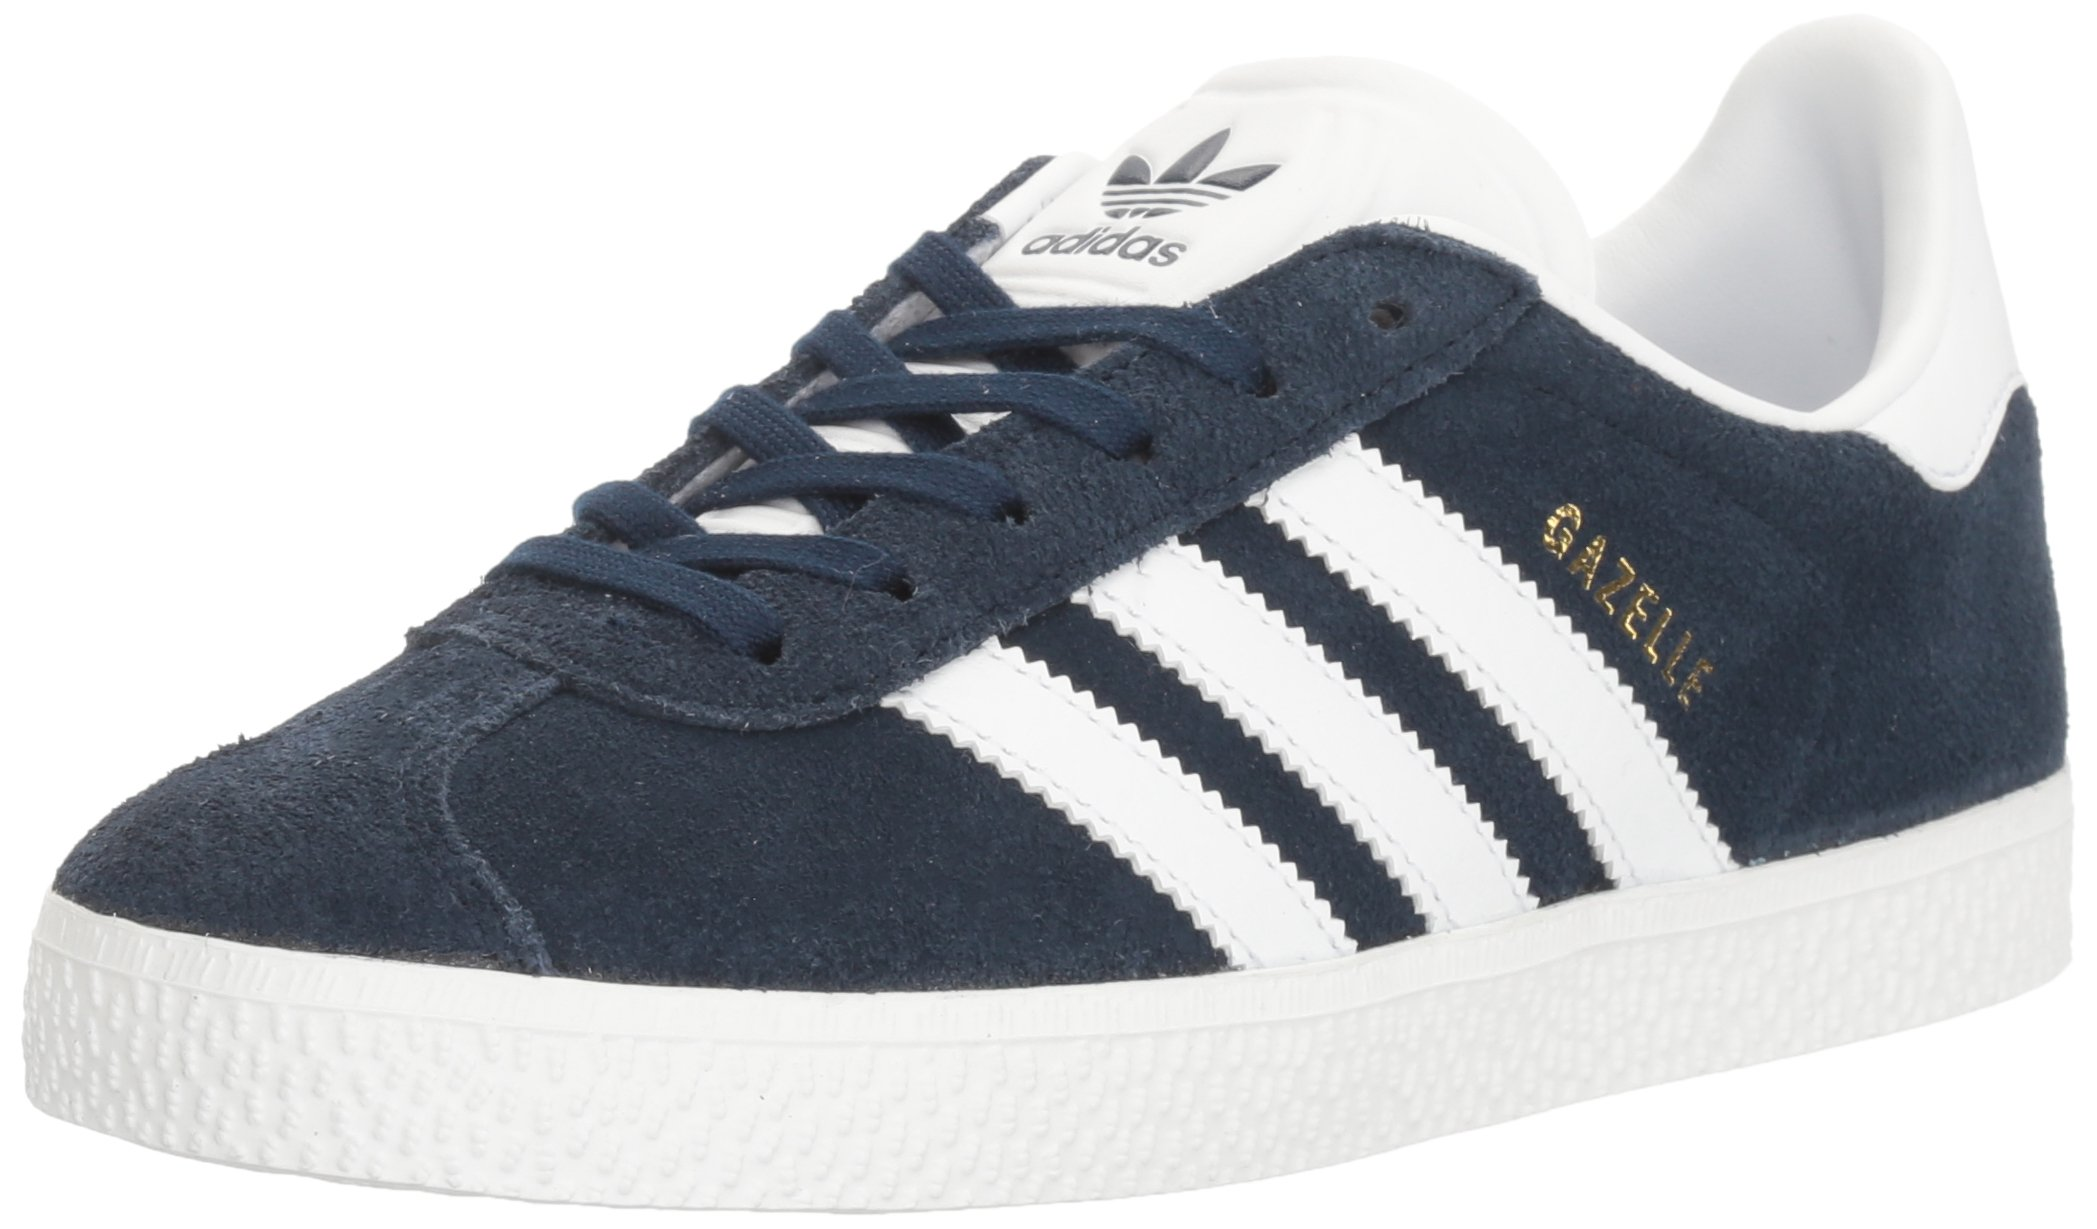 Adidas Originals Gazelle NavyWhite